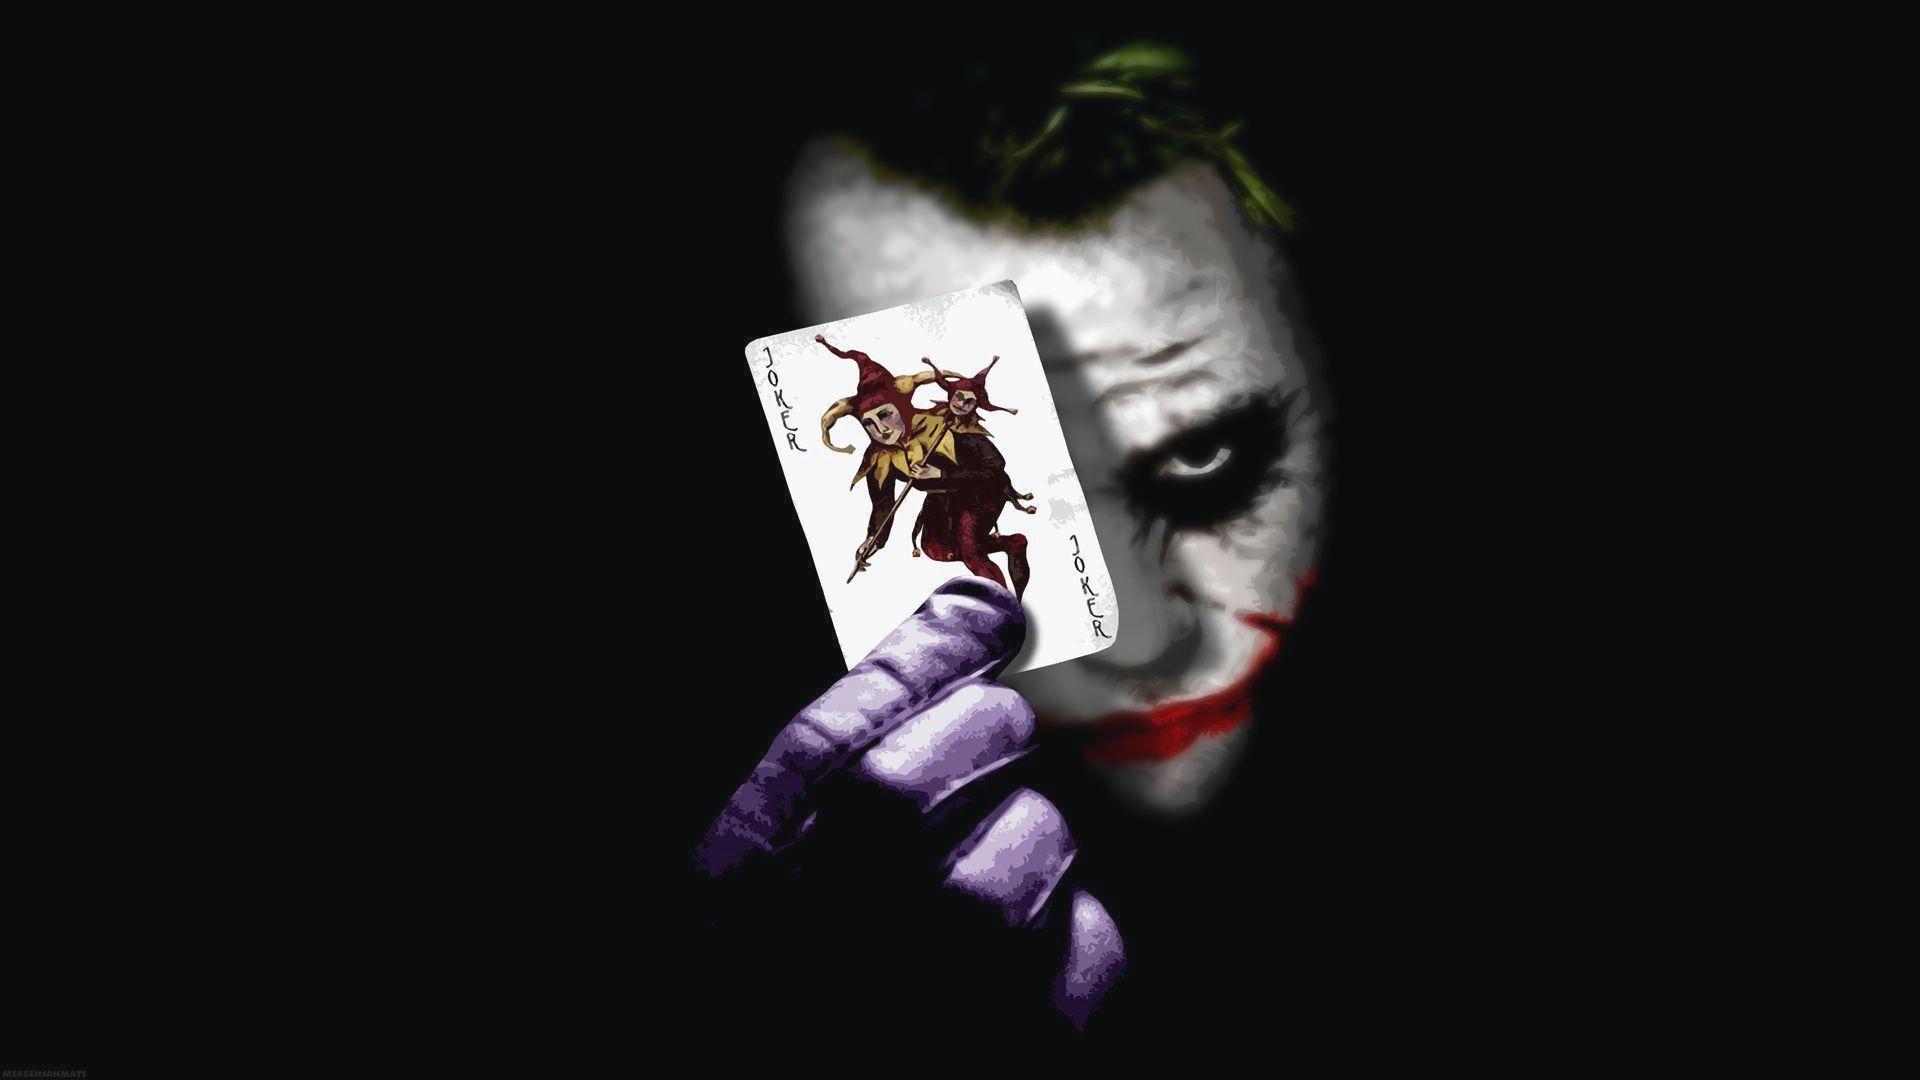 Joker Wallpapers Top Free Joker Backgrounds Wallpaperaccess Joker Hd Wallpaper Dark Knight Wallpaper Batman Joker Wallpaper